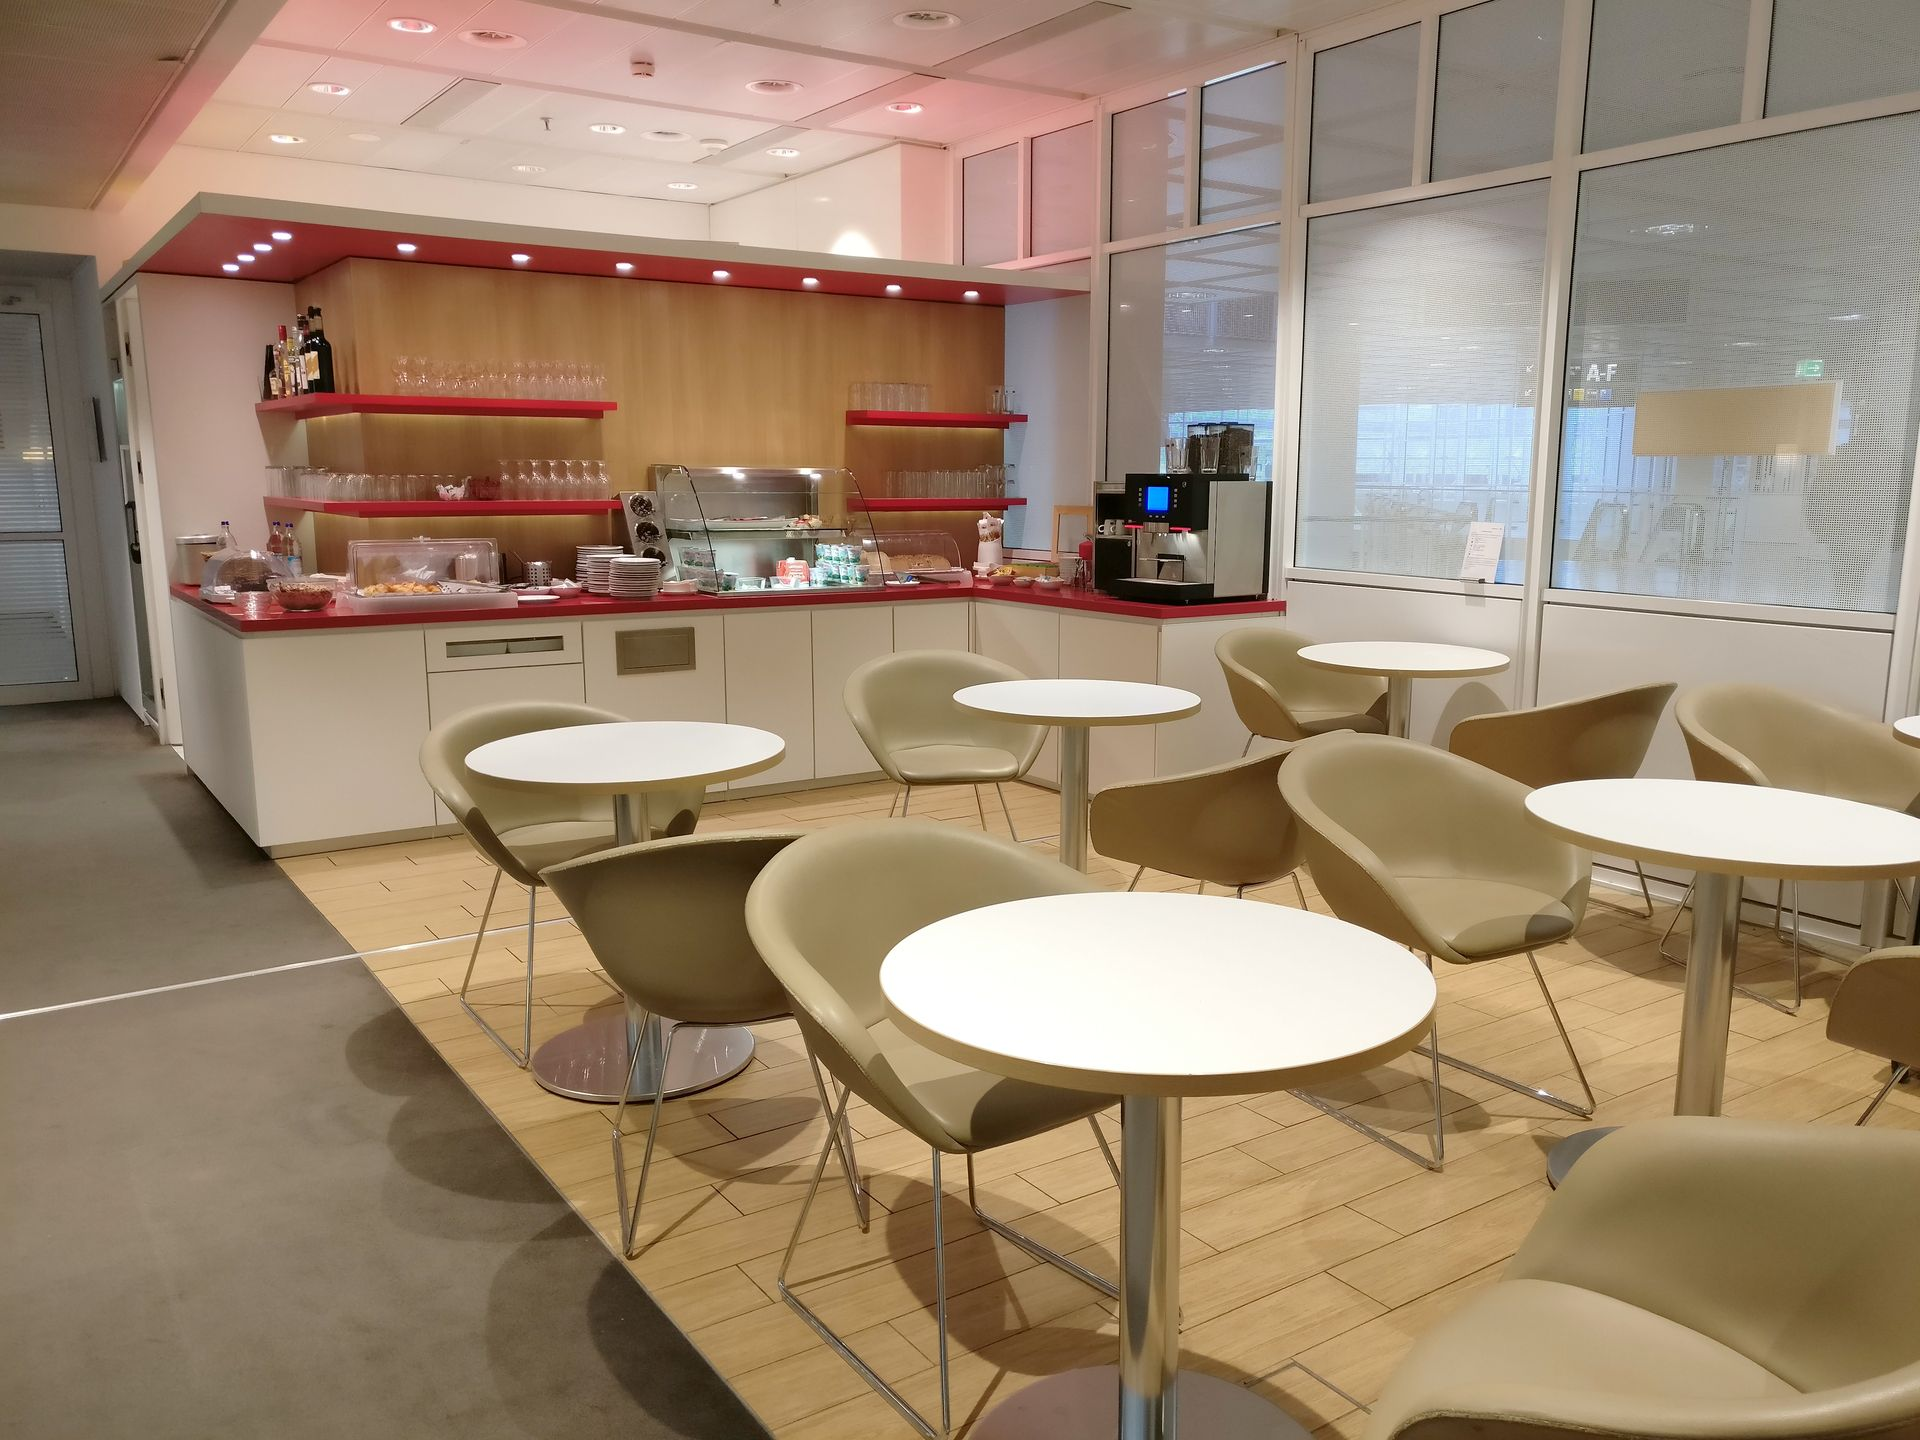 Air France Lounge Munich Seating